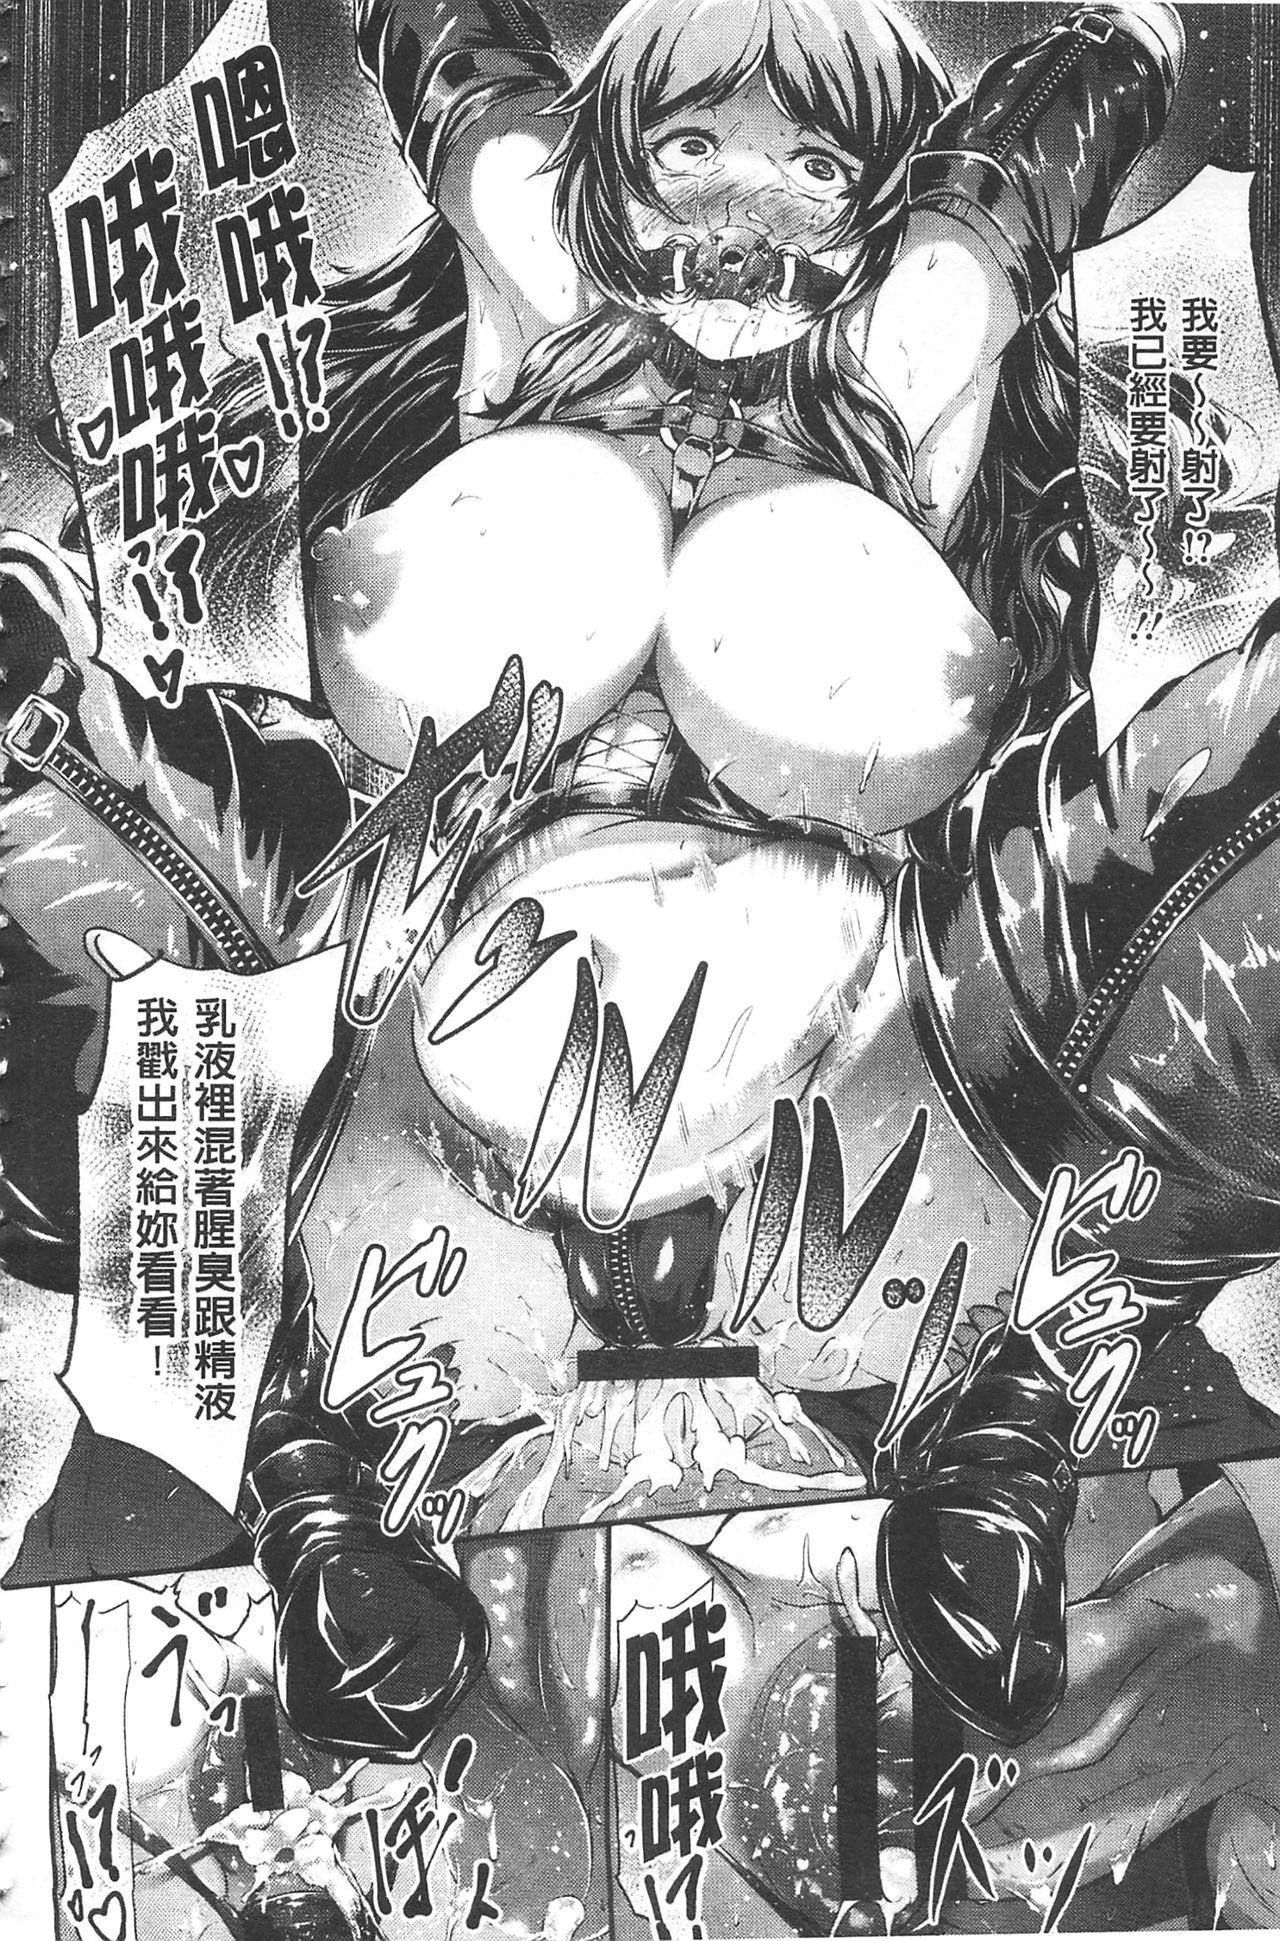 [Lorica] Biinkan Anal ~Kakusei Nejikomi Ana~ | 美淫感猥菊花 塞入擴張覺醒穴 [Chinese] 146